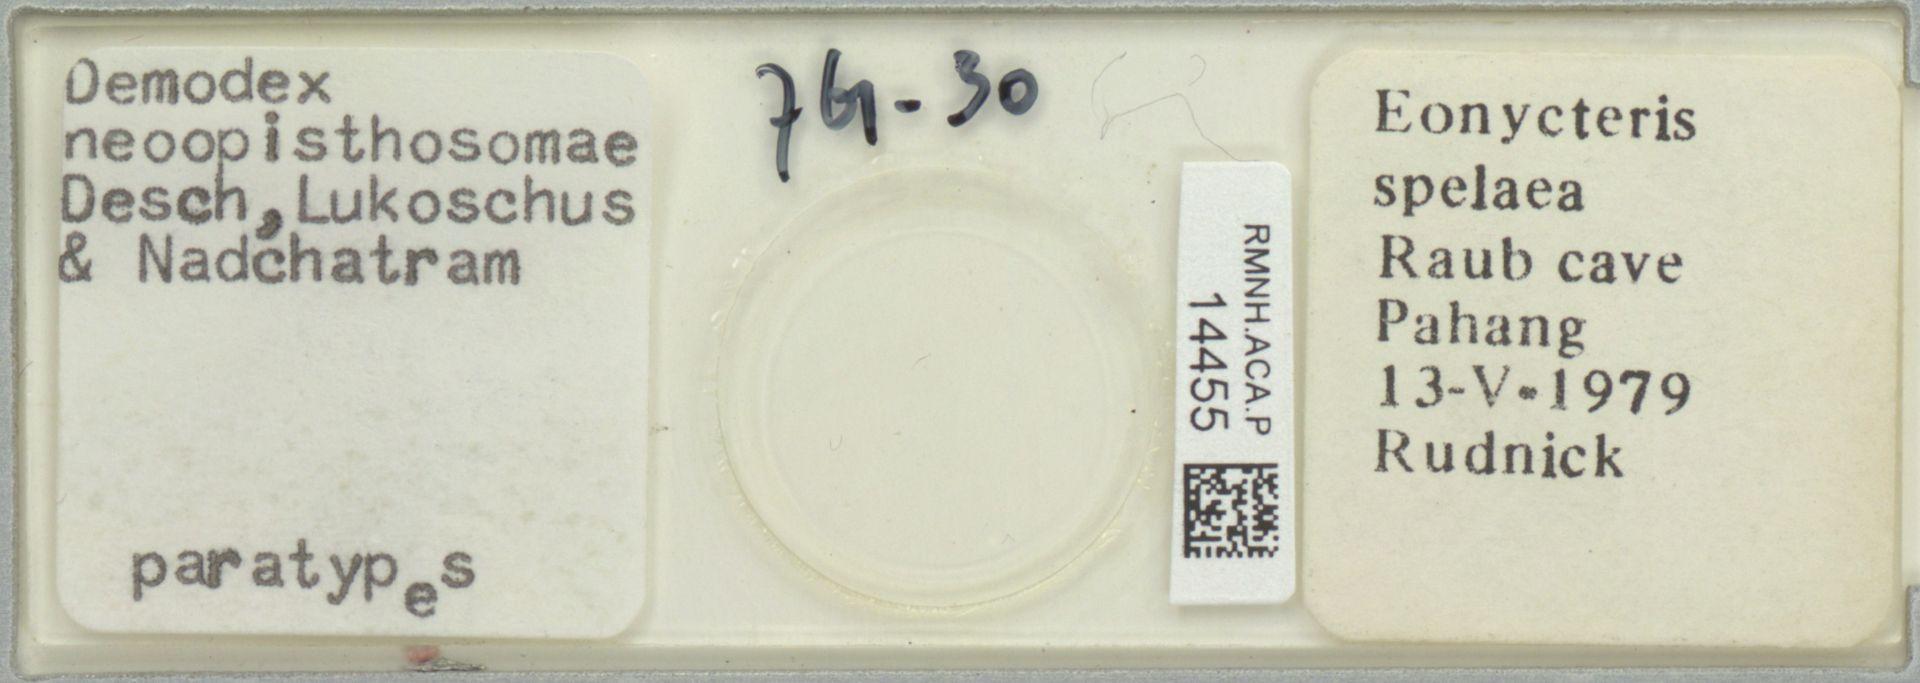 RMNH.ACA.P.14455 | Demodex neoopisthosomae